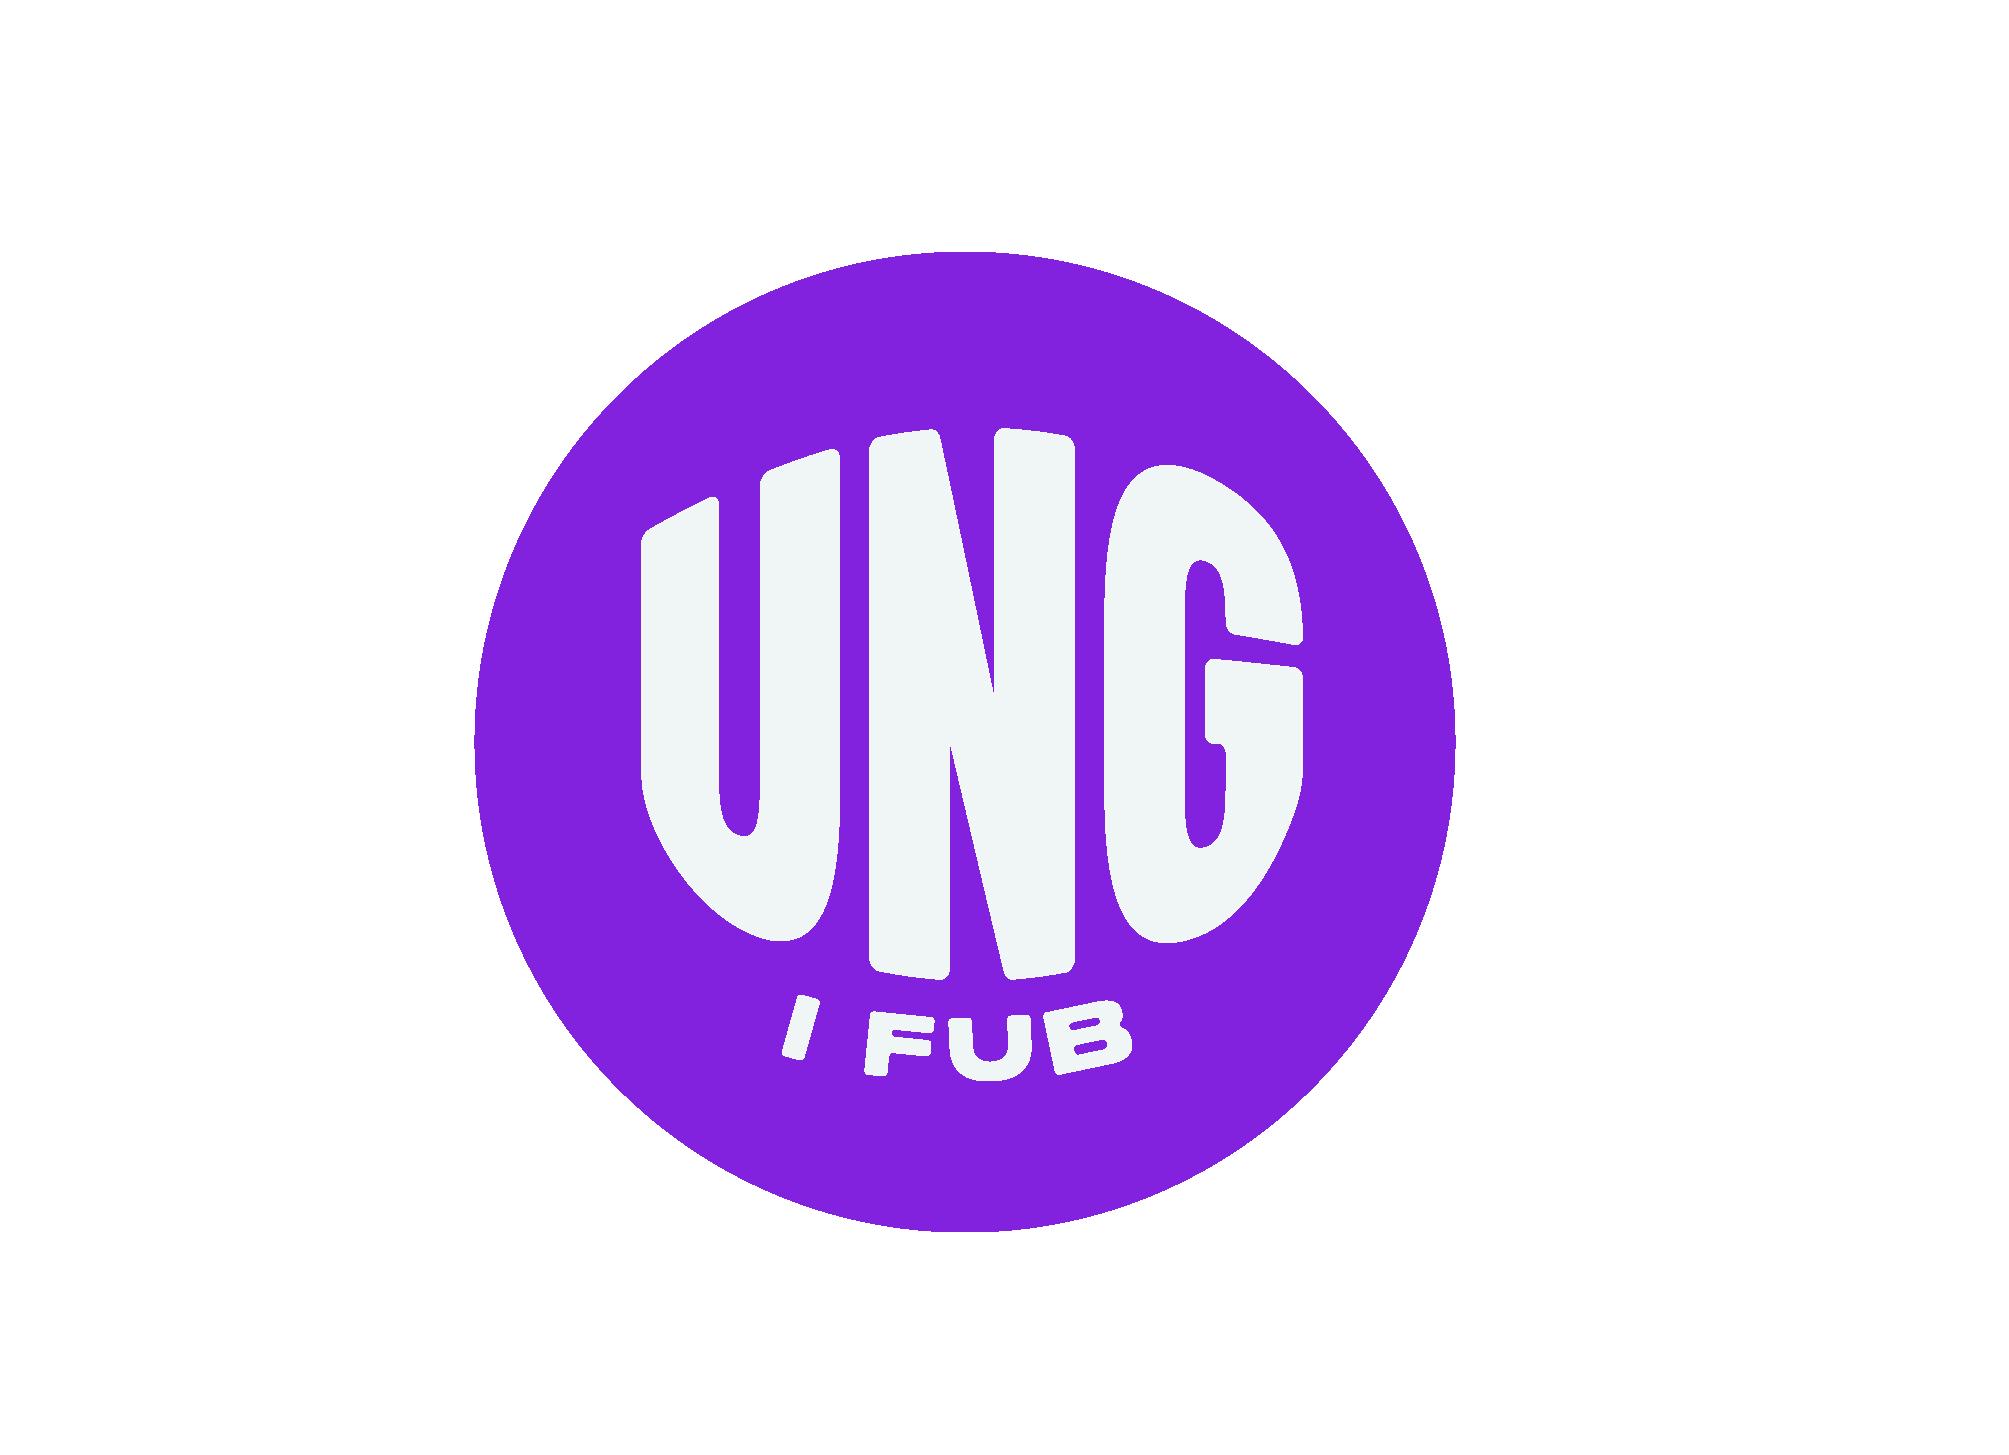 Ung i FUB-logotyp, lilla